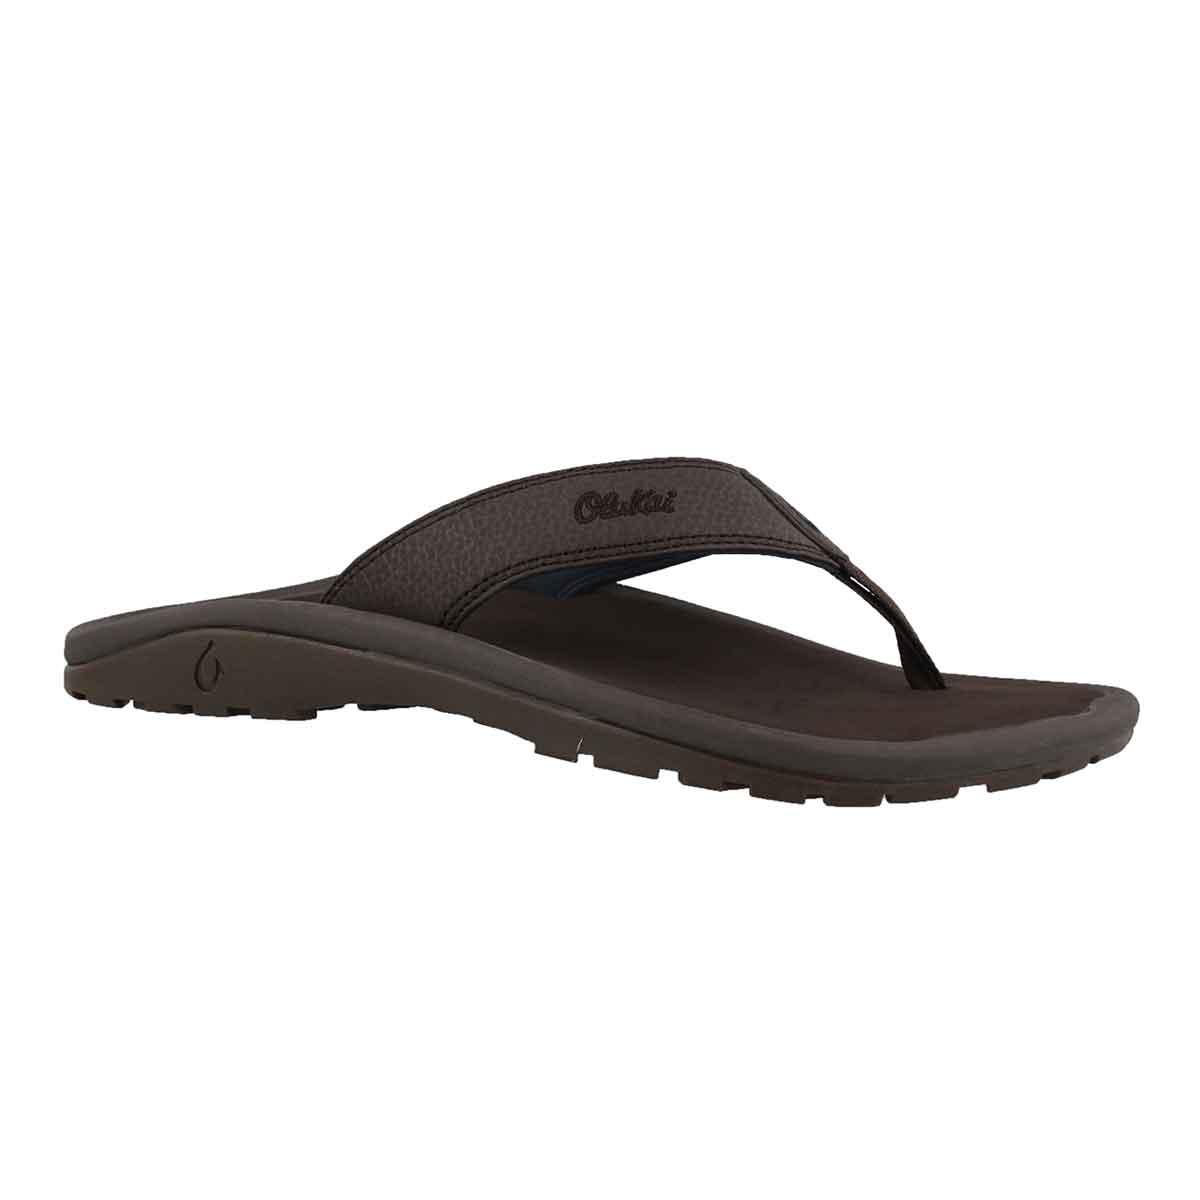 Men's OHANA dark wood thong sandals